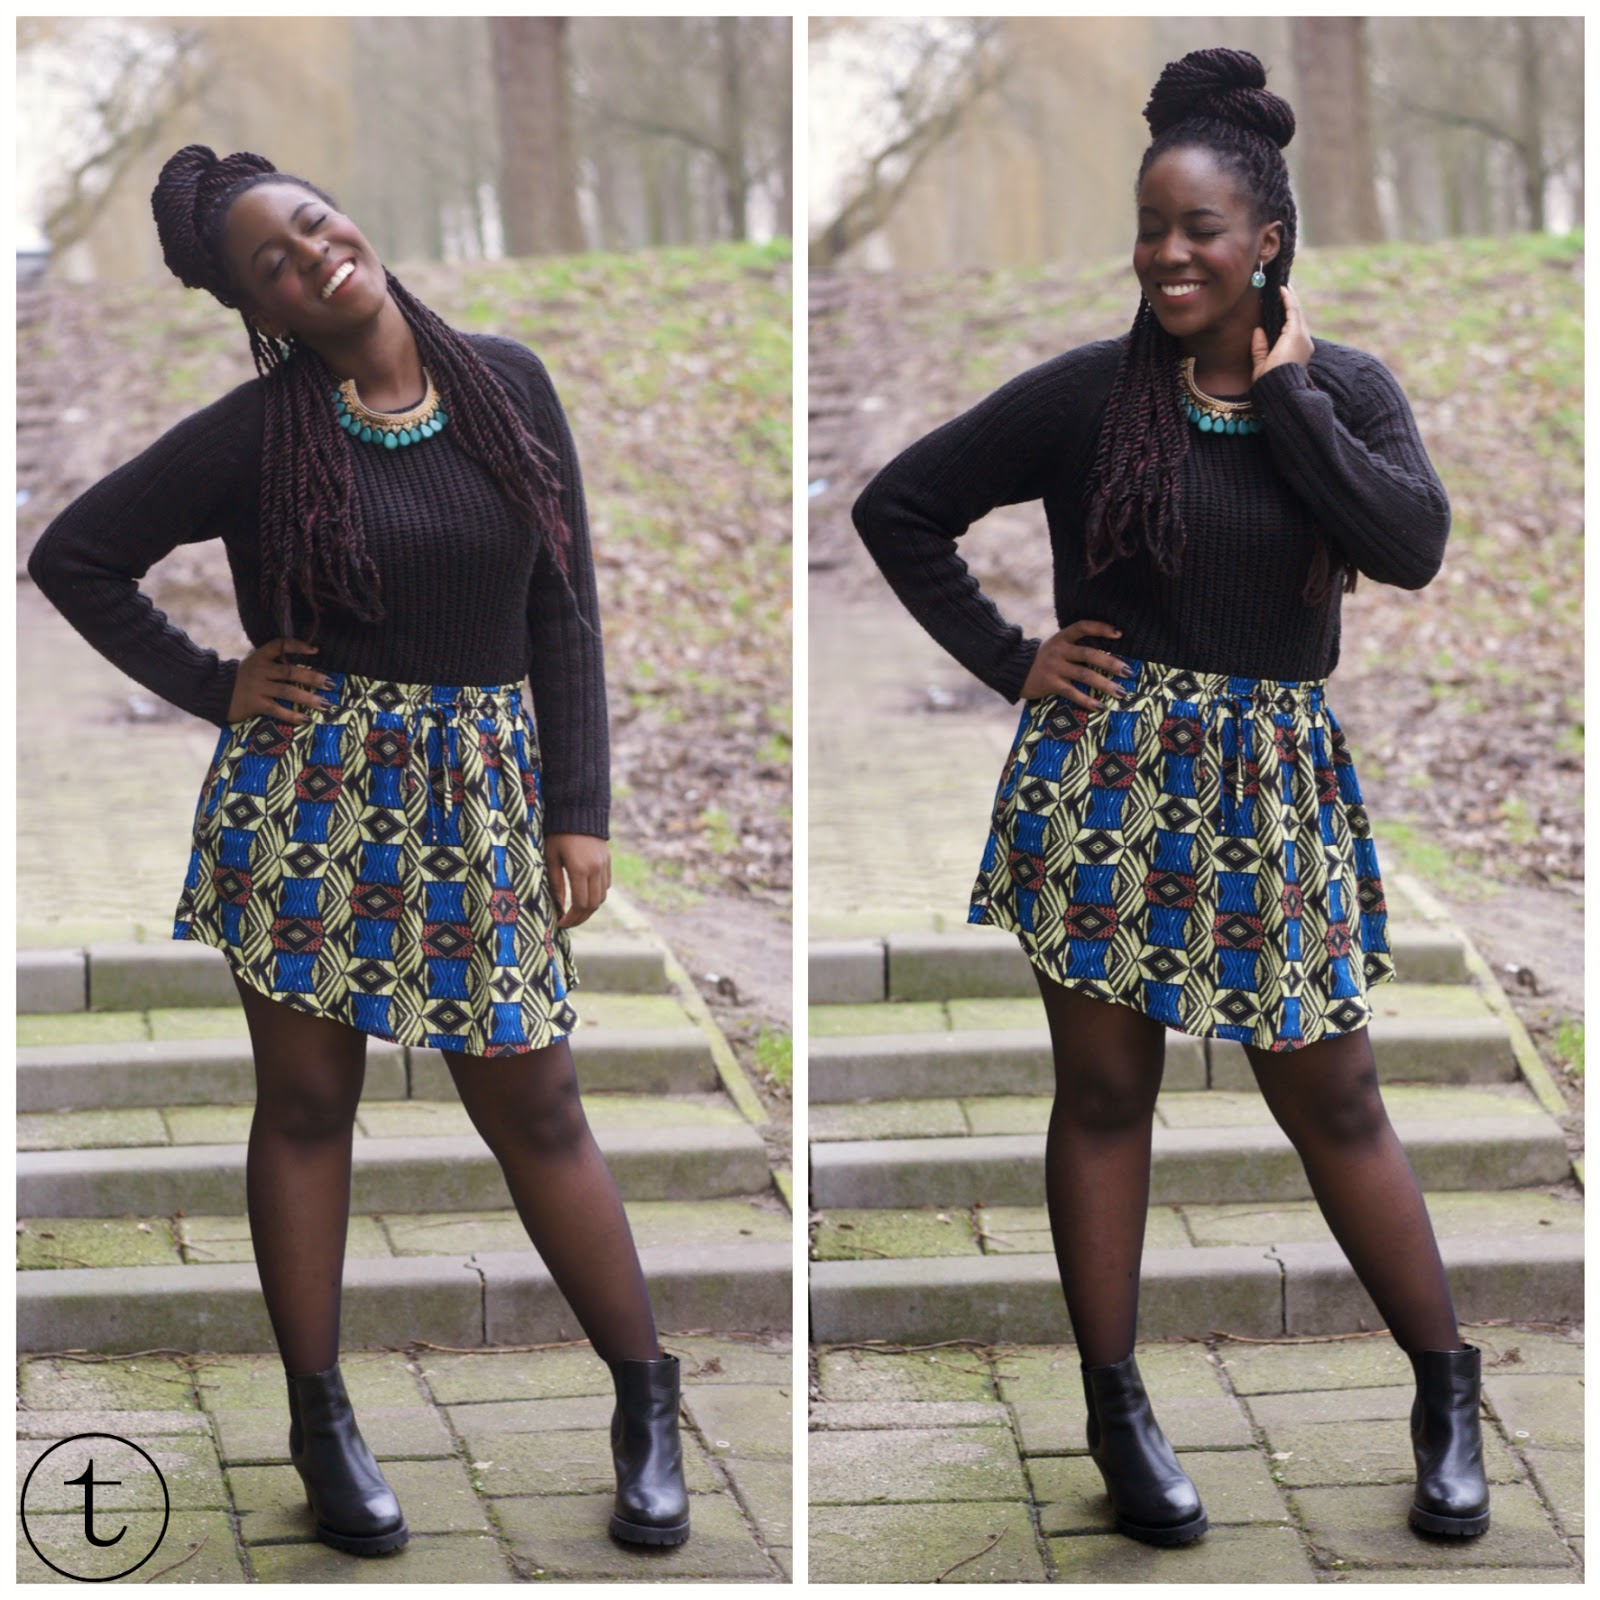 skirt with prints